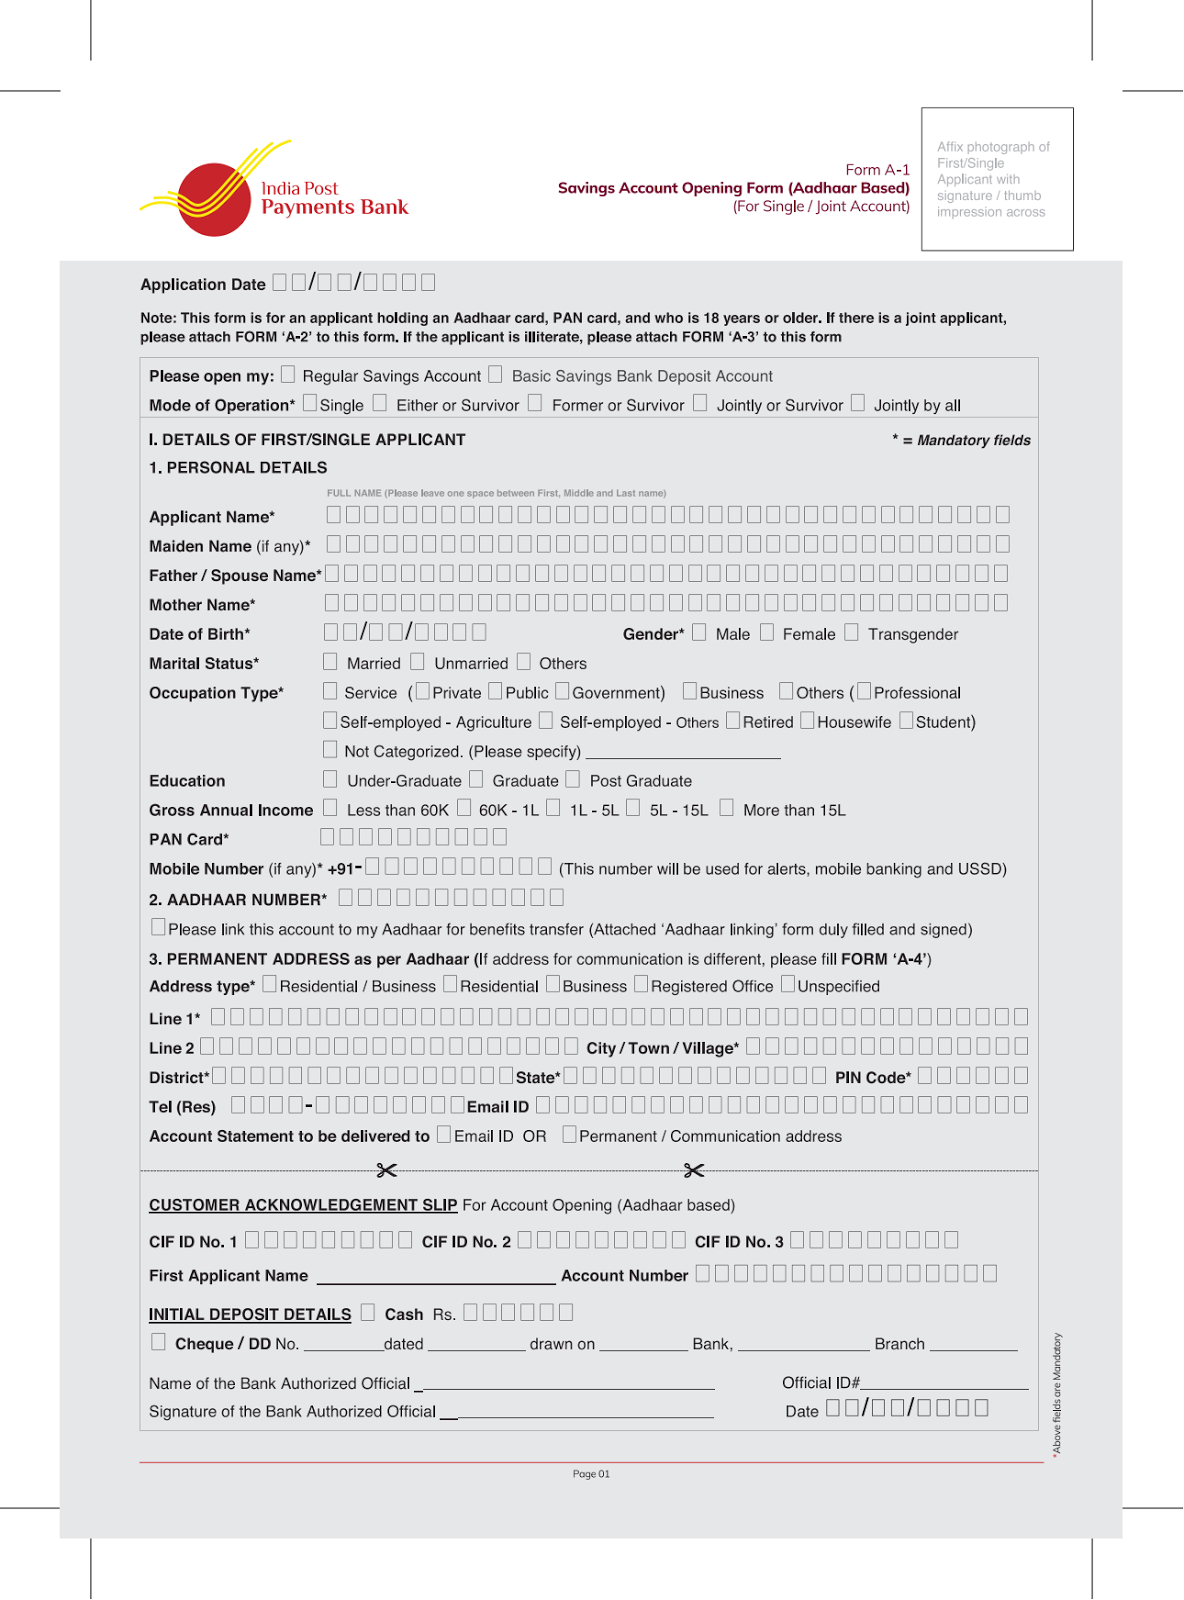 indian bank saving bank account opening form for individual